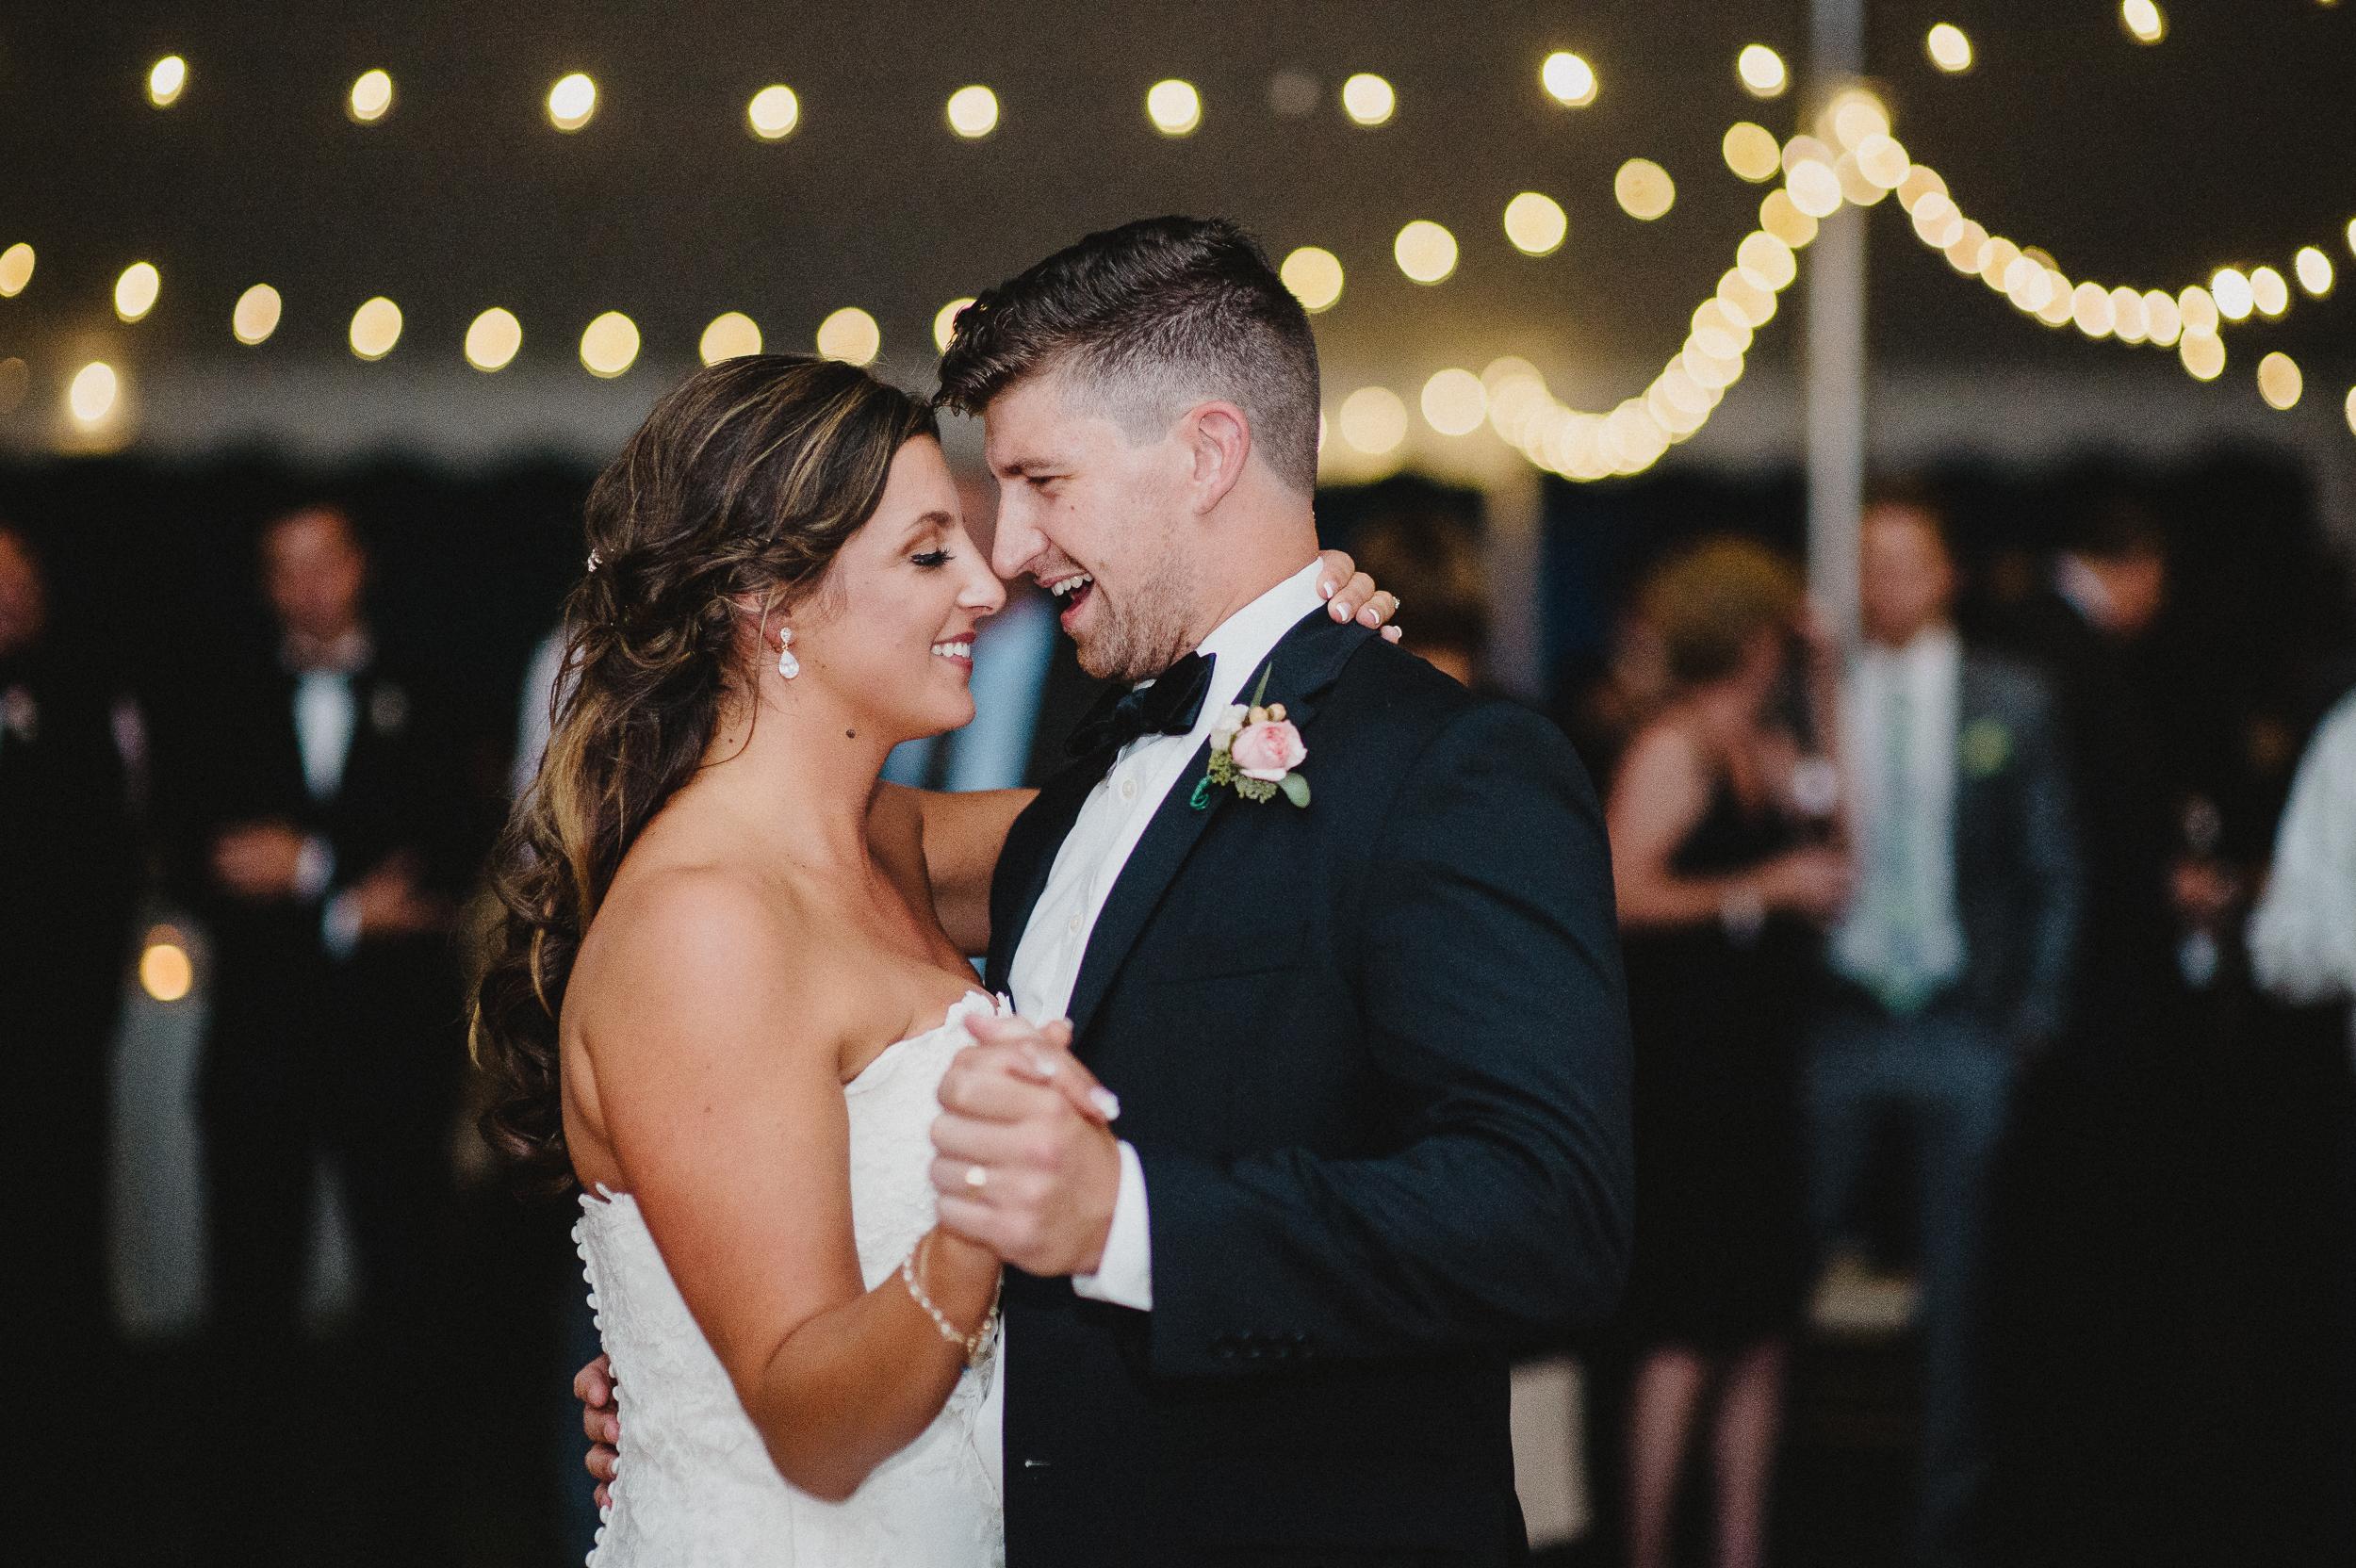 delaware-estate-wedding-photographer-pat-robinson-photography-105.jpg